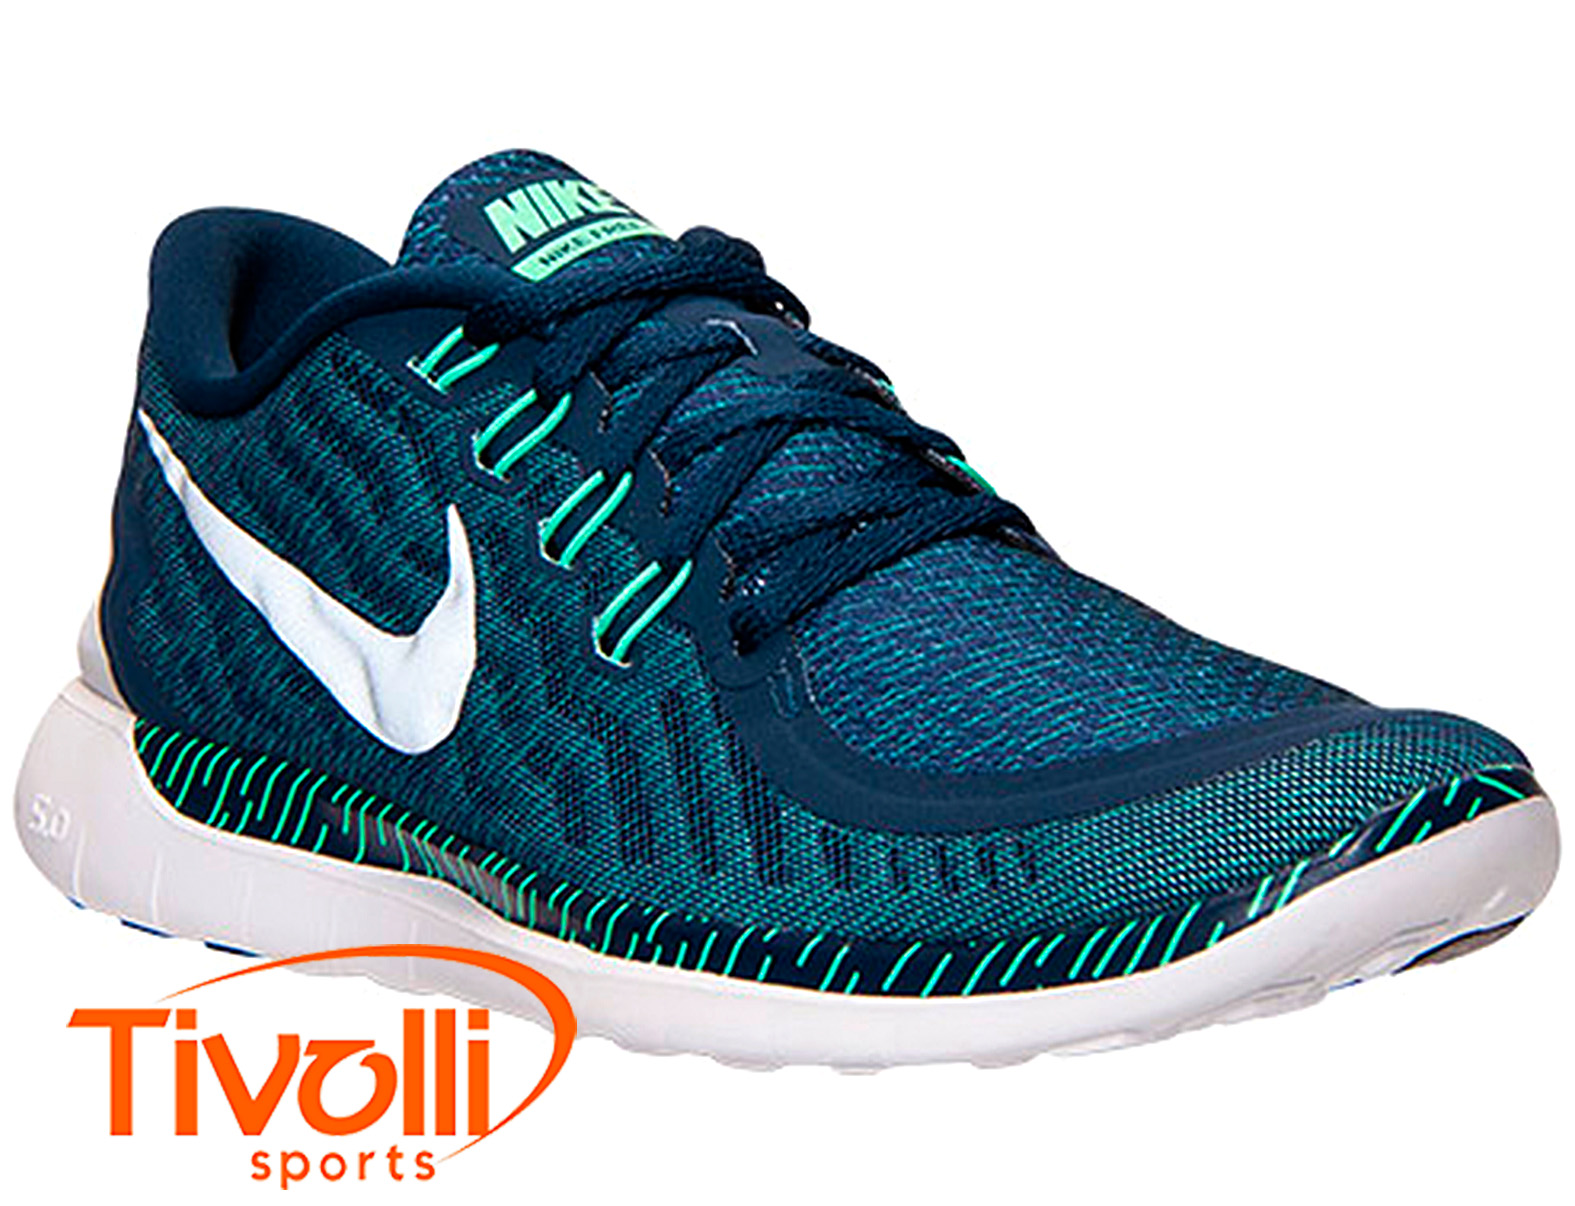 ca2dd6b9986 Tênis Nike Free 5.0 Print masculino   marinho